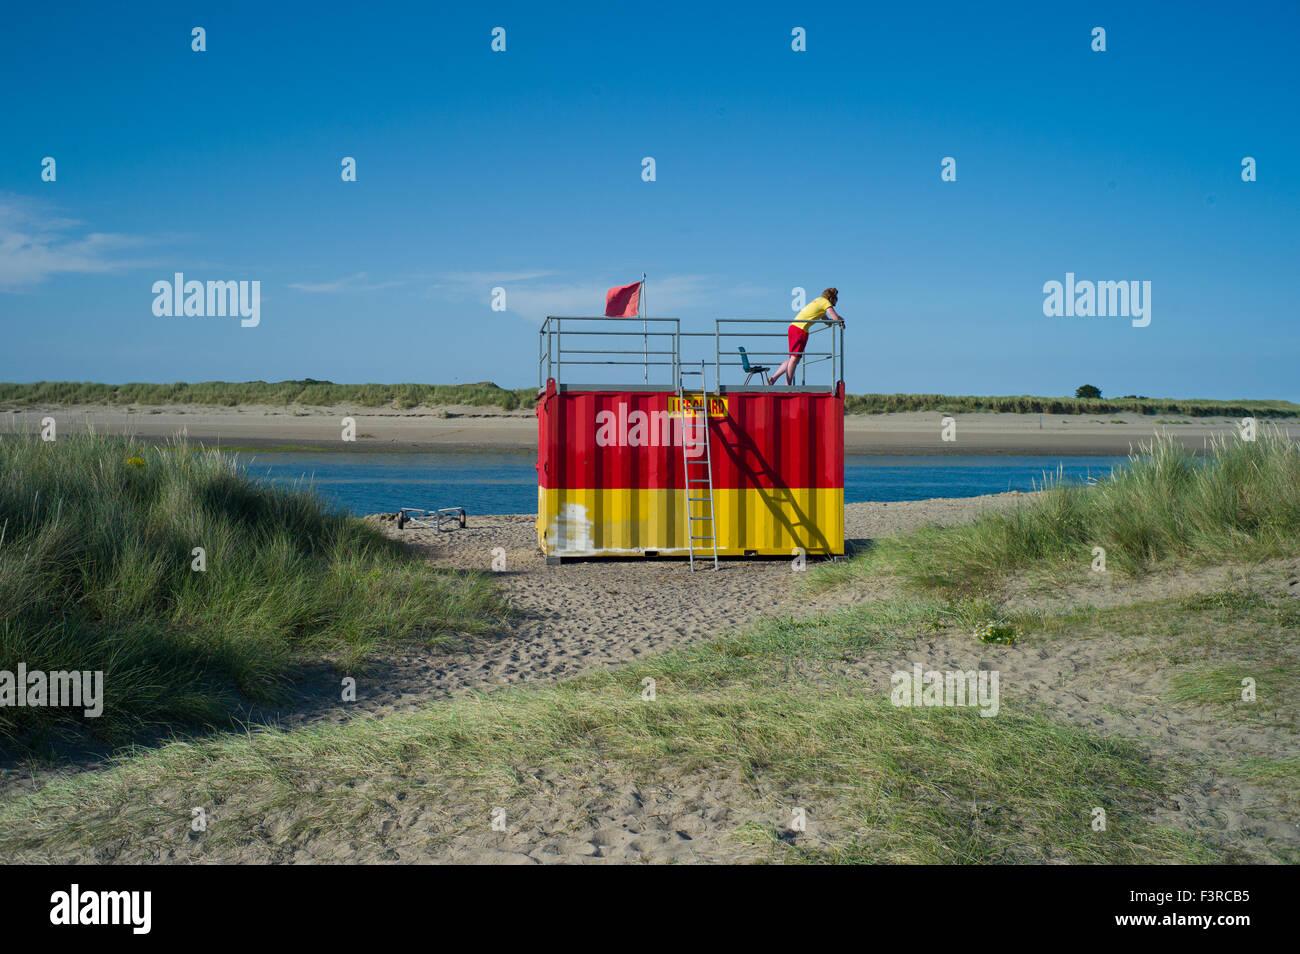 Lifeguard on watch at Malahide, Dublin - Stock Image